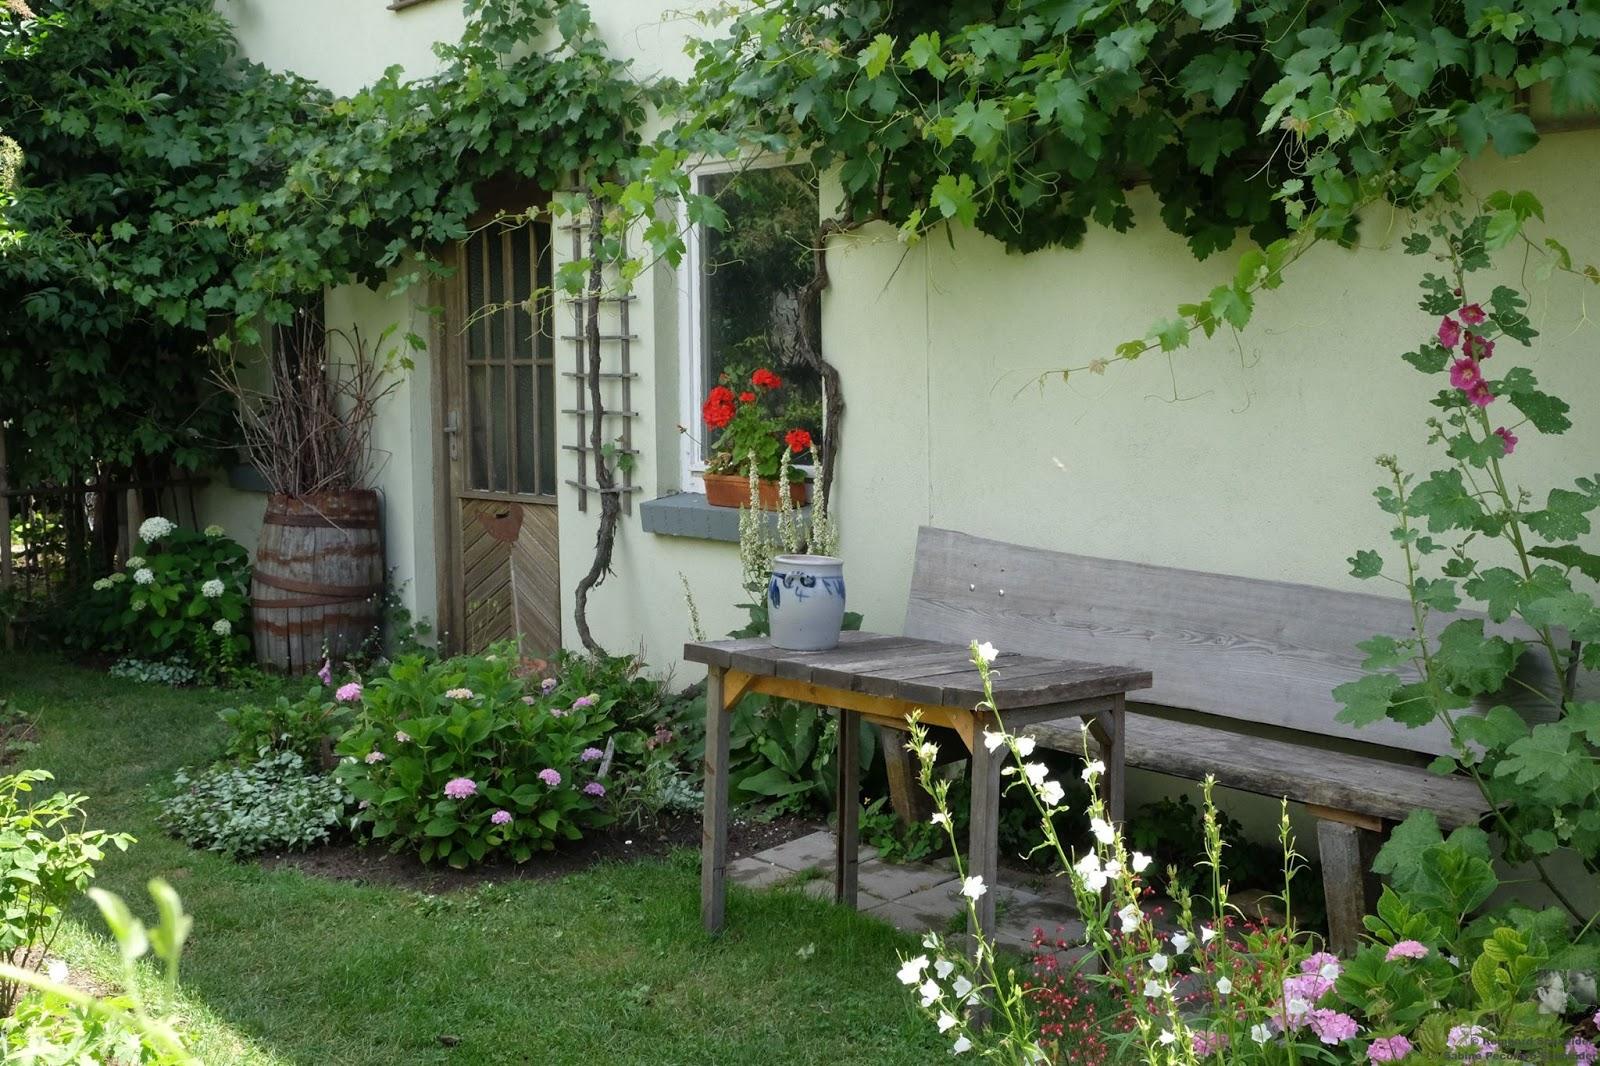 Jardin campestre en Baja Franconia, Baviera